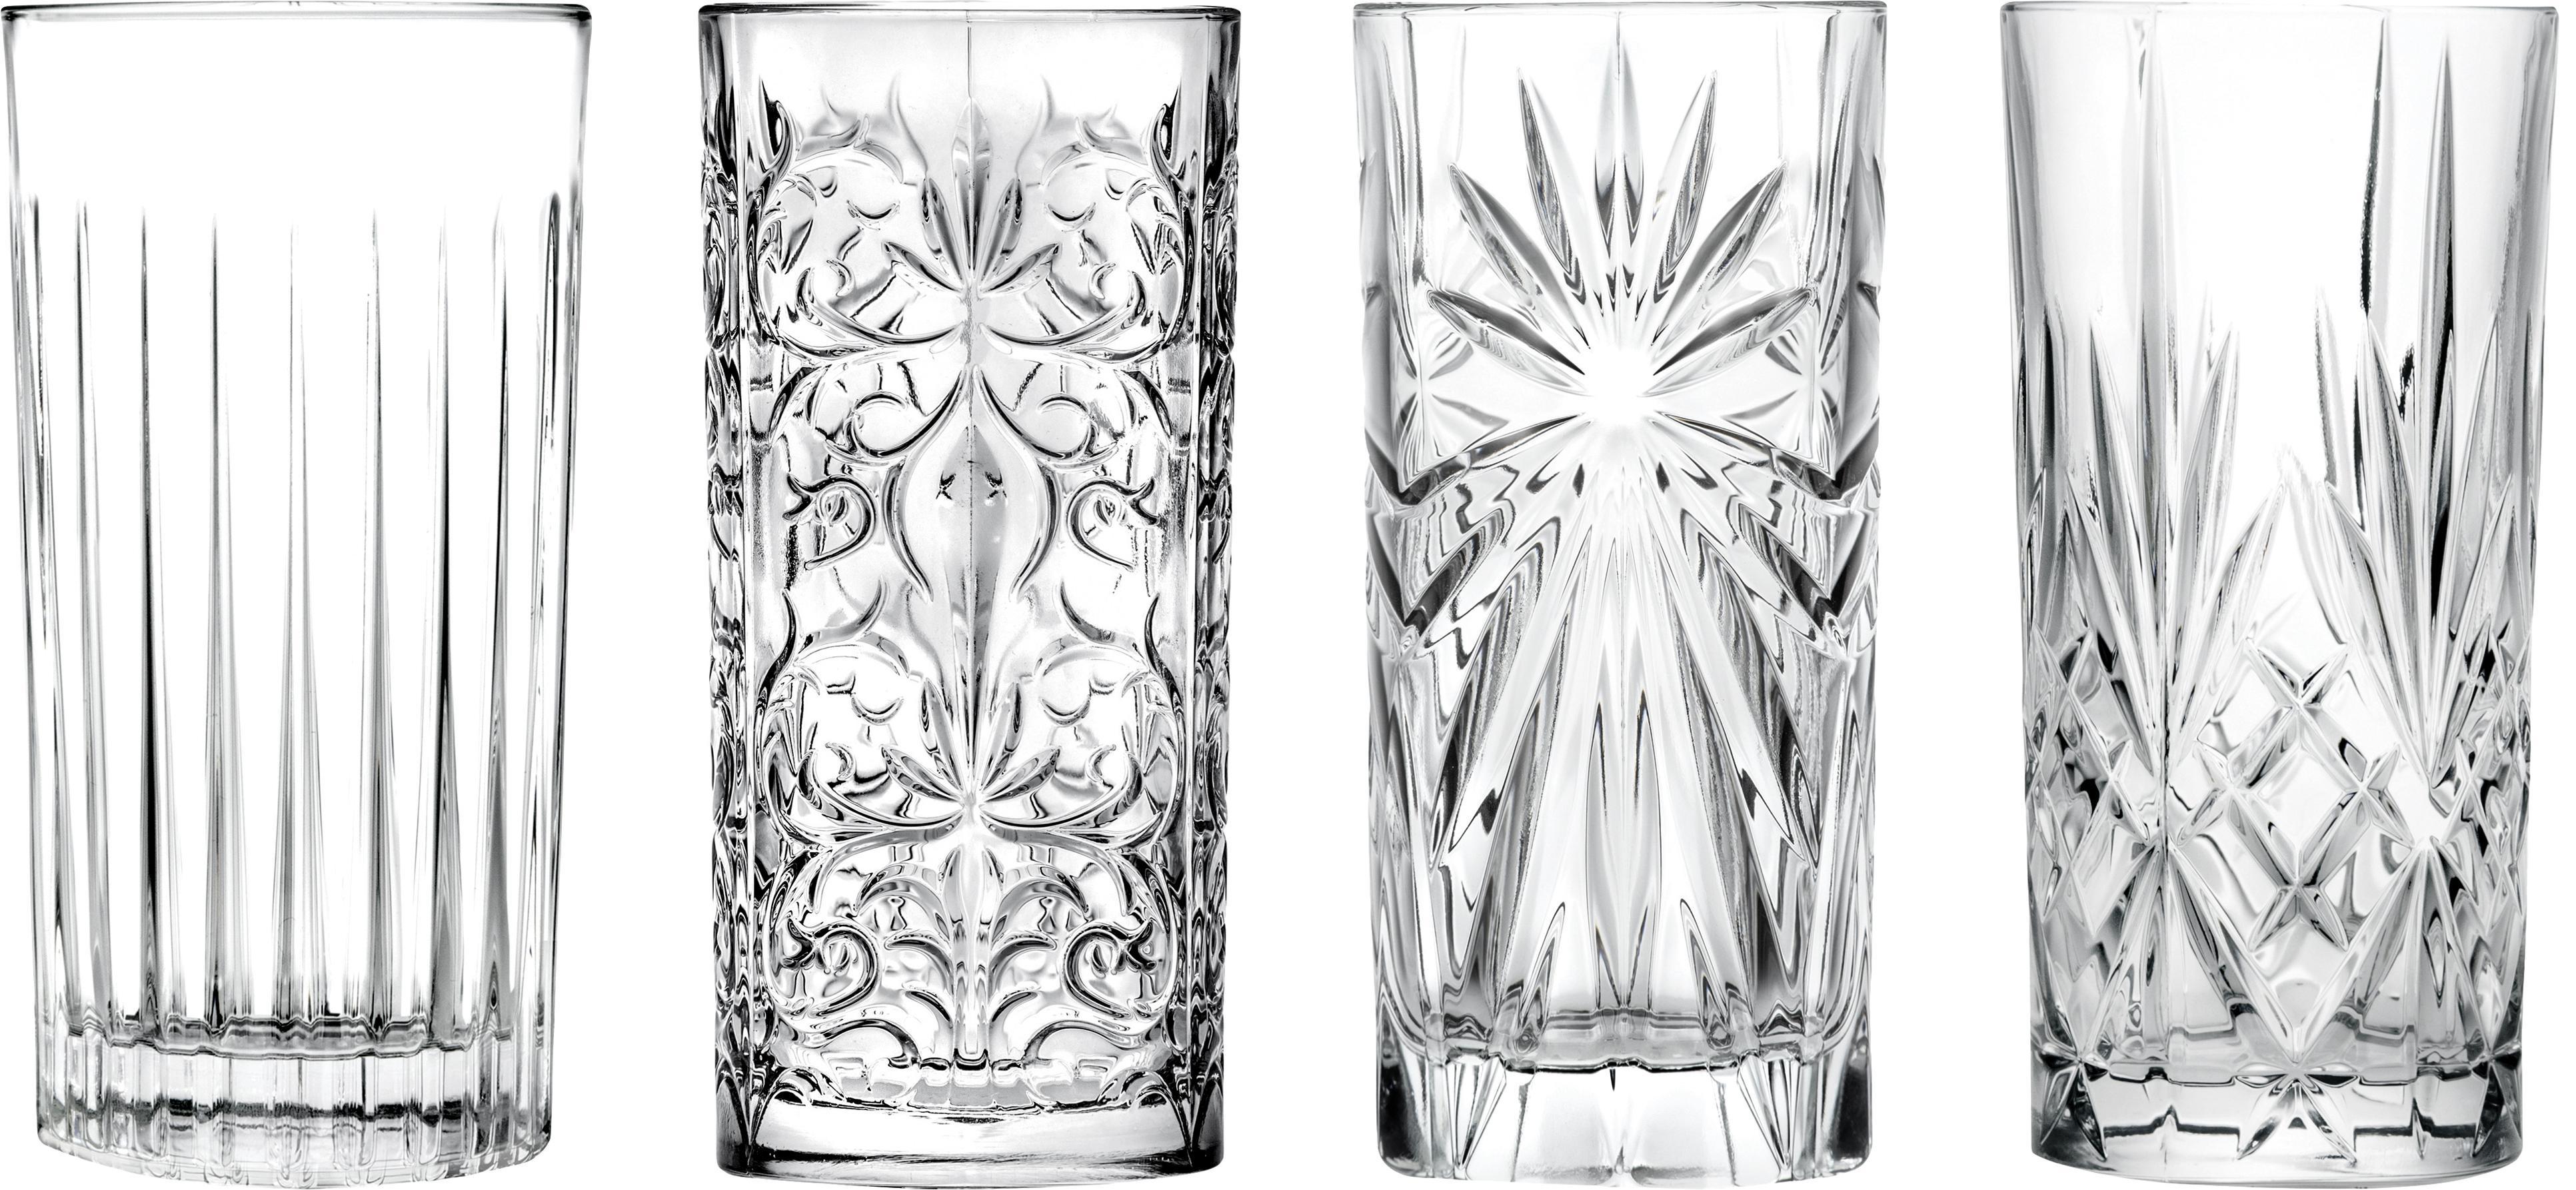 Kristallen longdrinkglazenset Bichiera, 4-delig, Kristalglas, Transparant, Ø 7 x H 15 cm